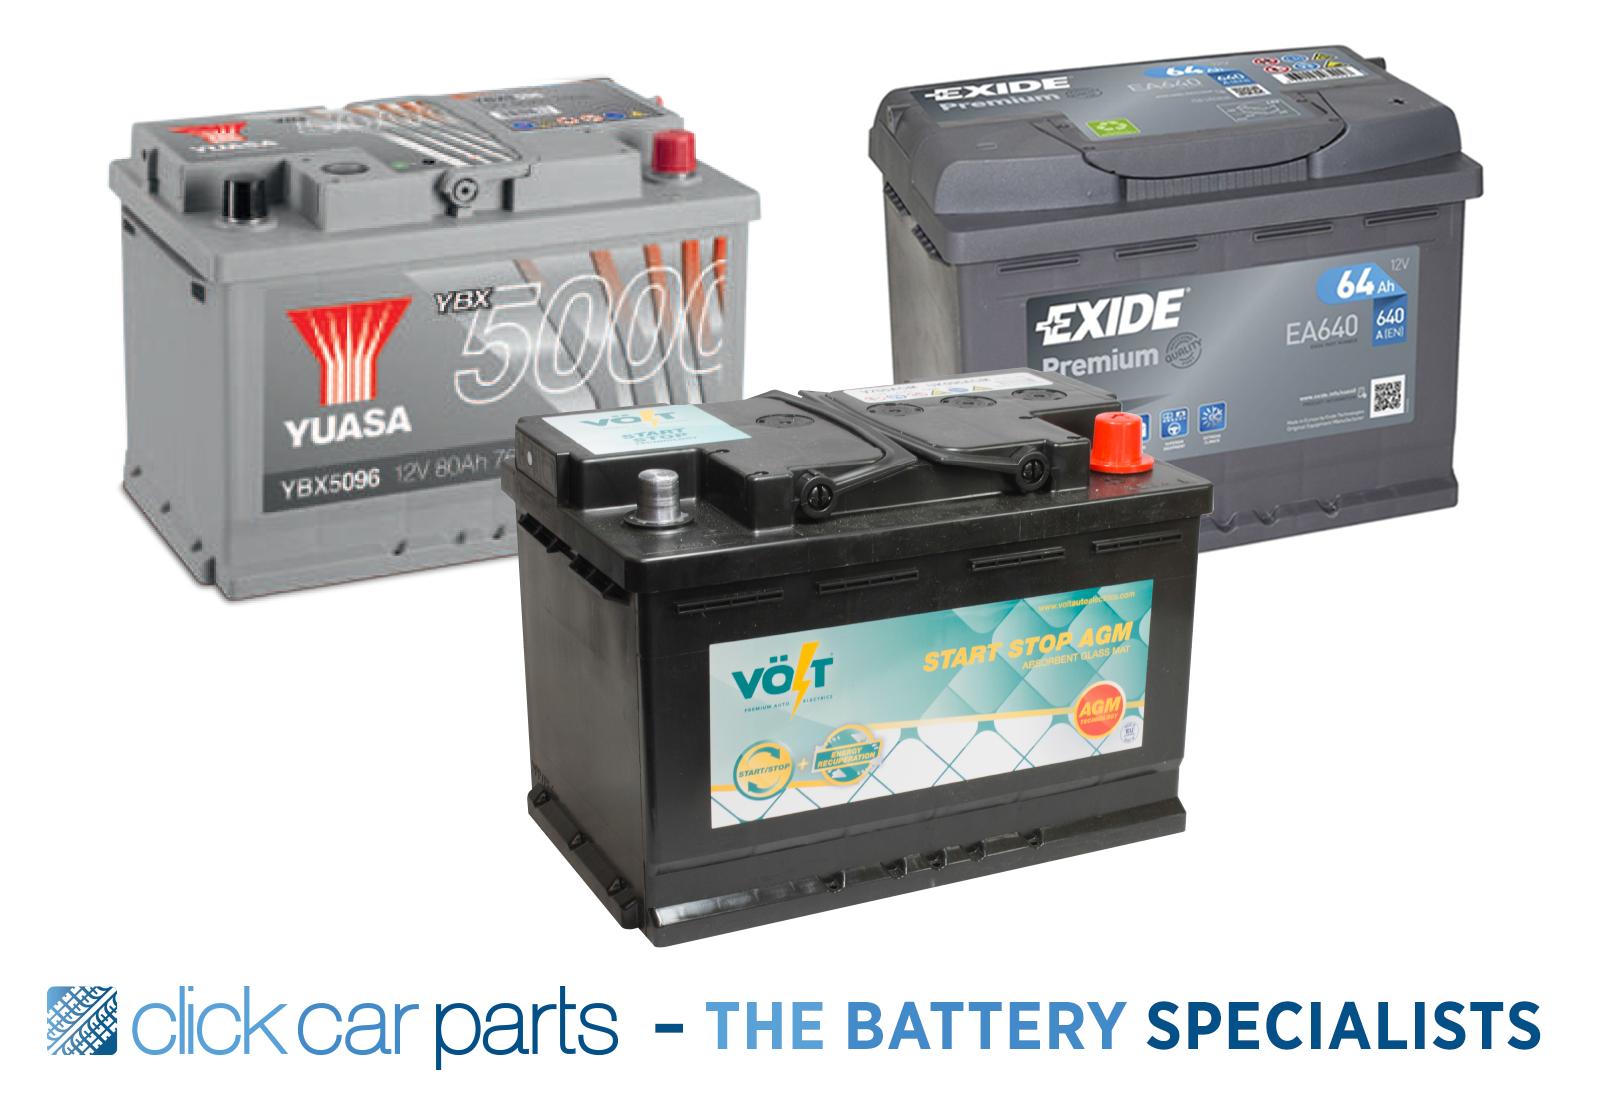 Batterie Pour Ford Transit 2000-2019 MK6 MK7 MK8 Custom 110 75Ah 2.2 2.4 Diesel